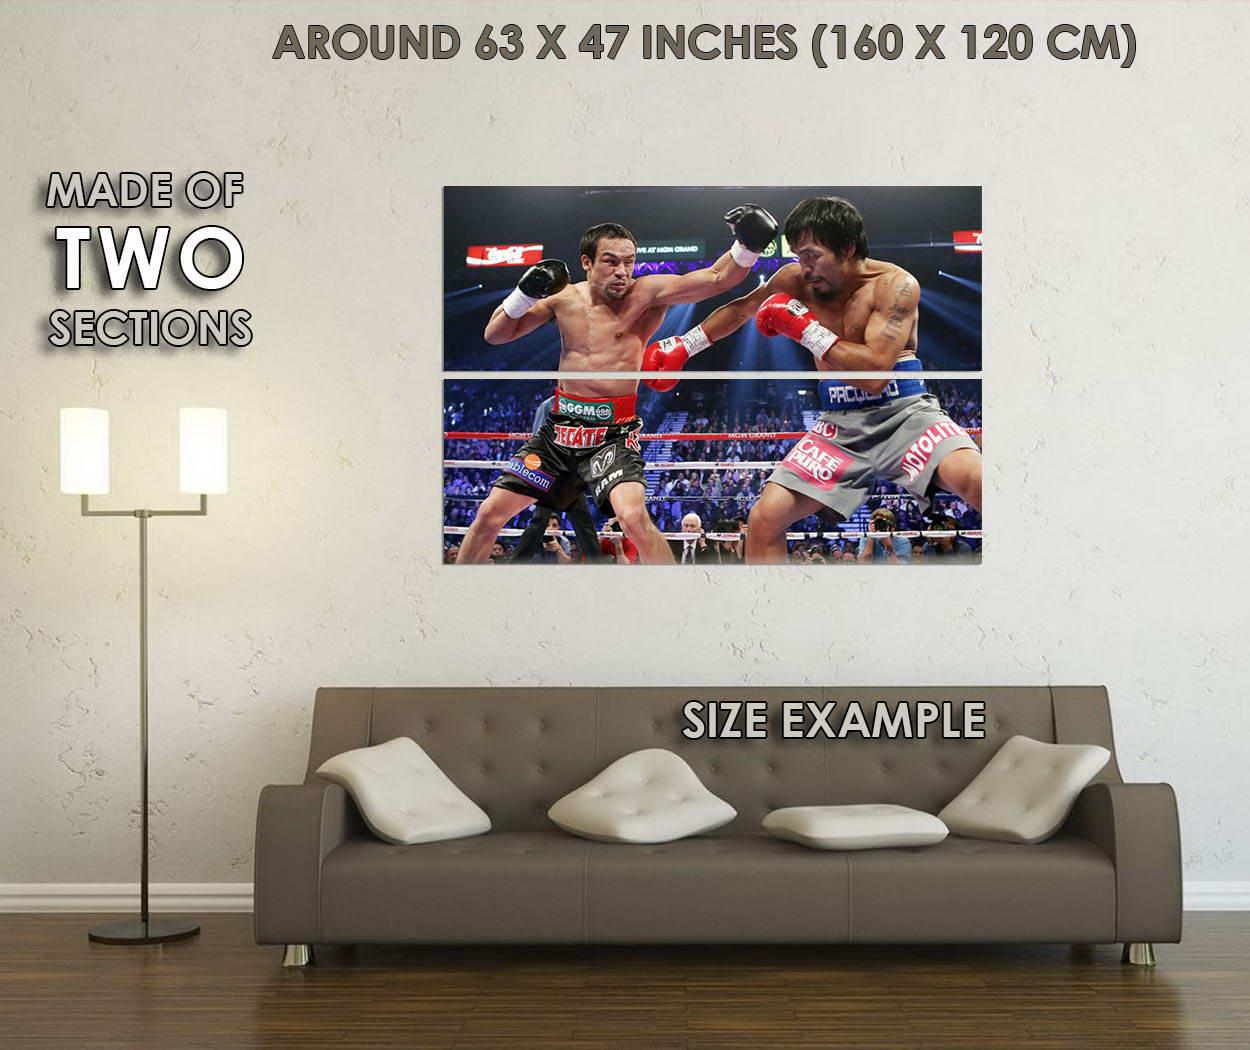 10556-Manny-Pacquiao-vs-Juan-Manuel-Marquez-Boxing-LAMINATED-POSTER-CA thumbnail 6